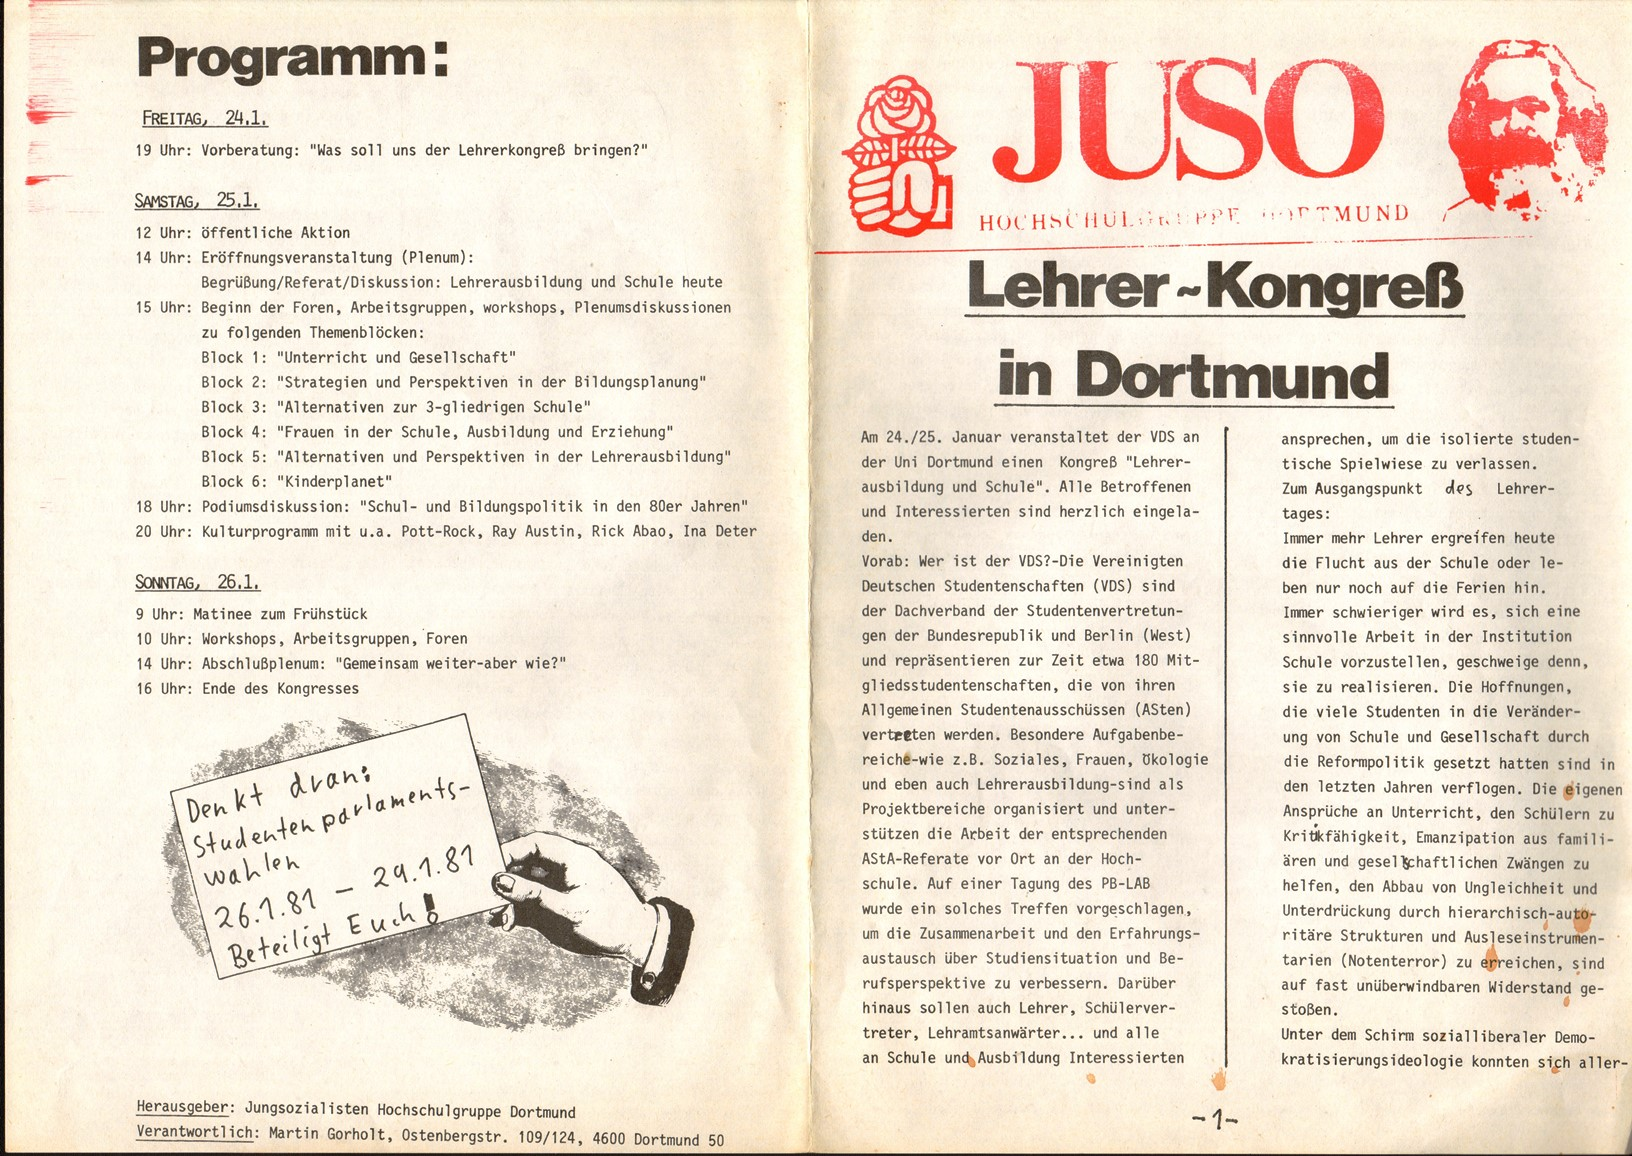 Dortmund_JUSO_HSG_1981_003_01